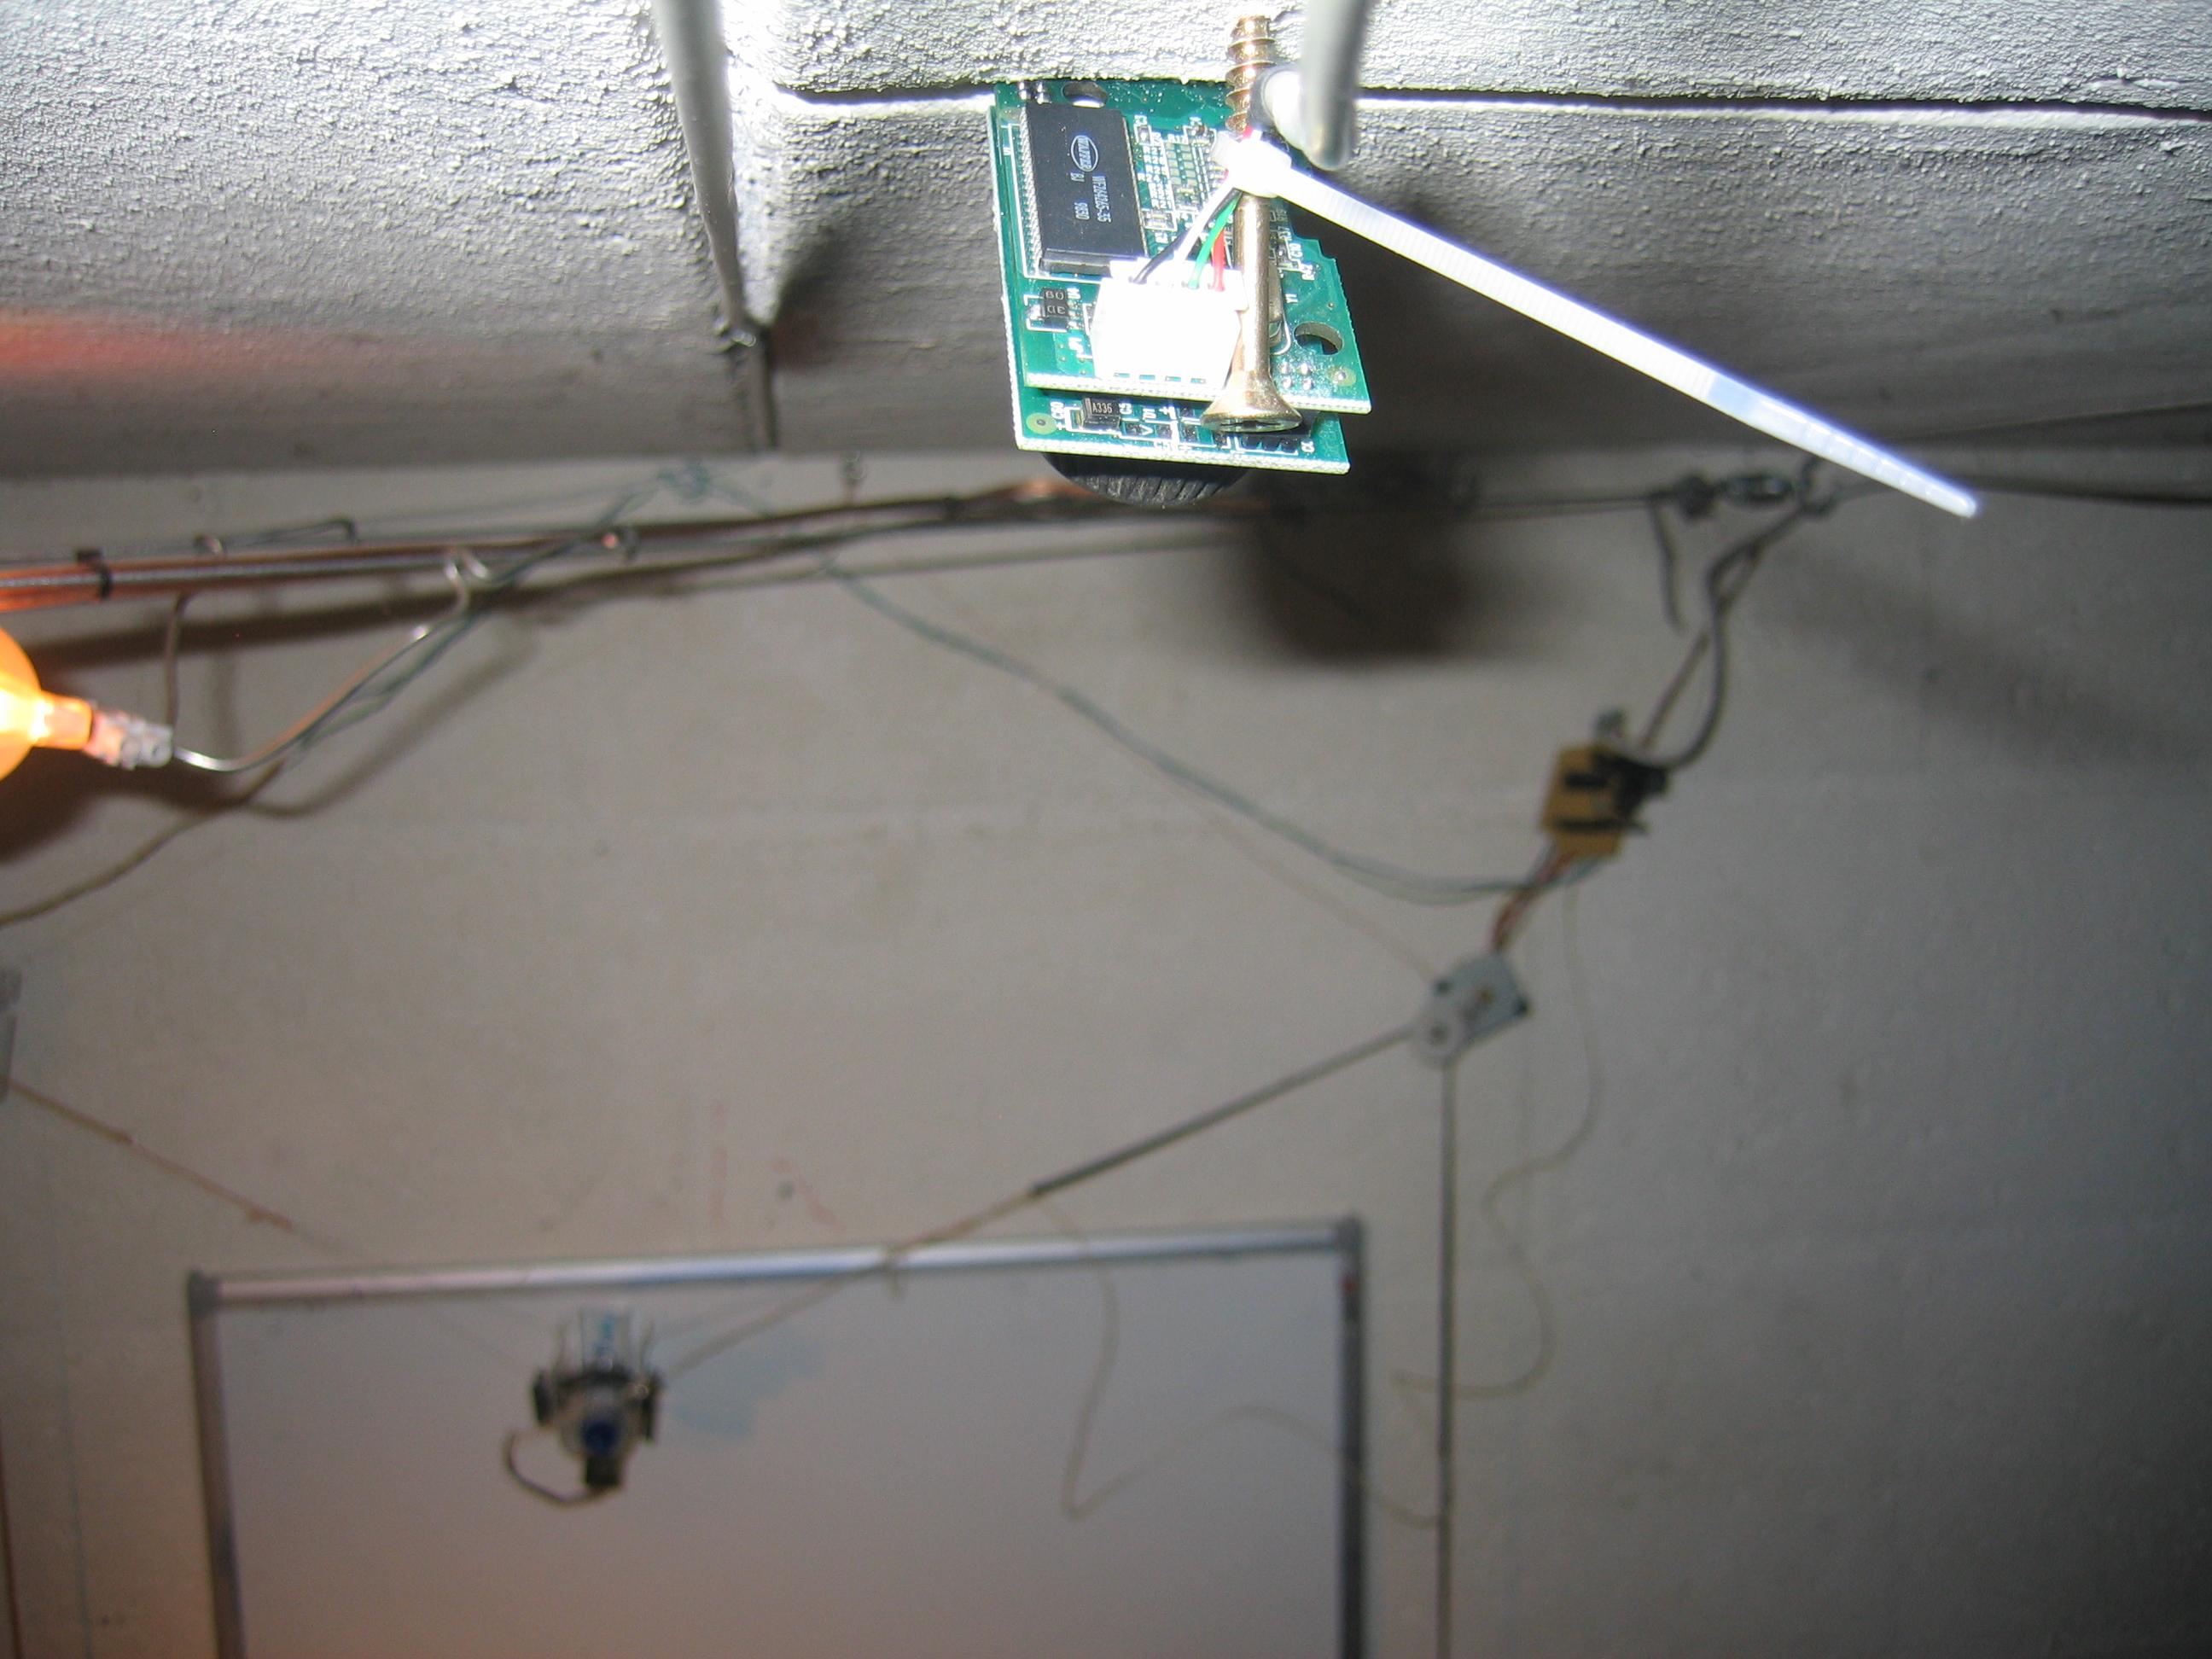 img 3356 webcam server software in the urls. server partition software.com